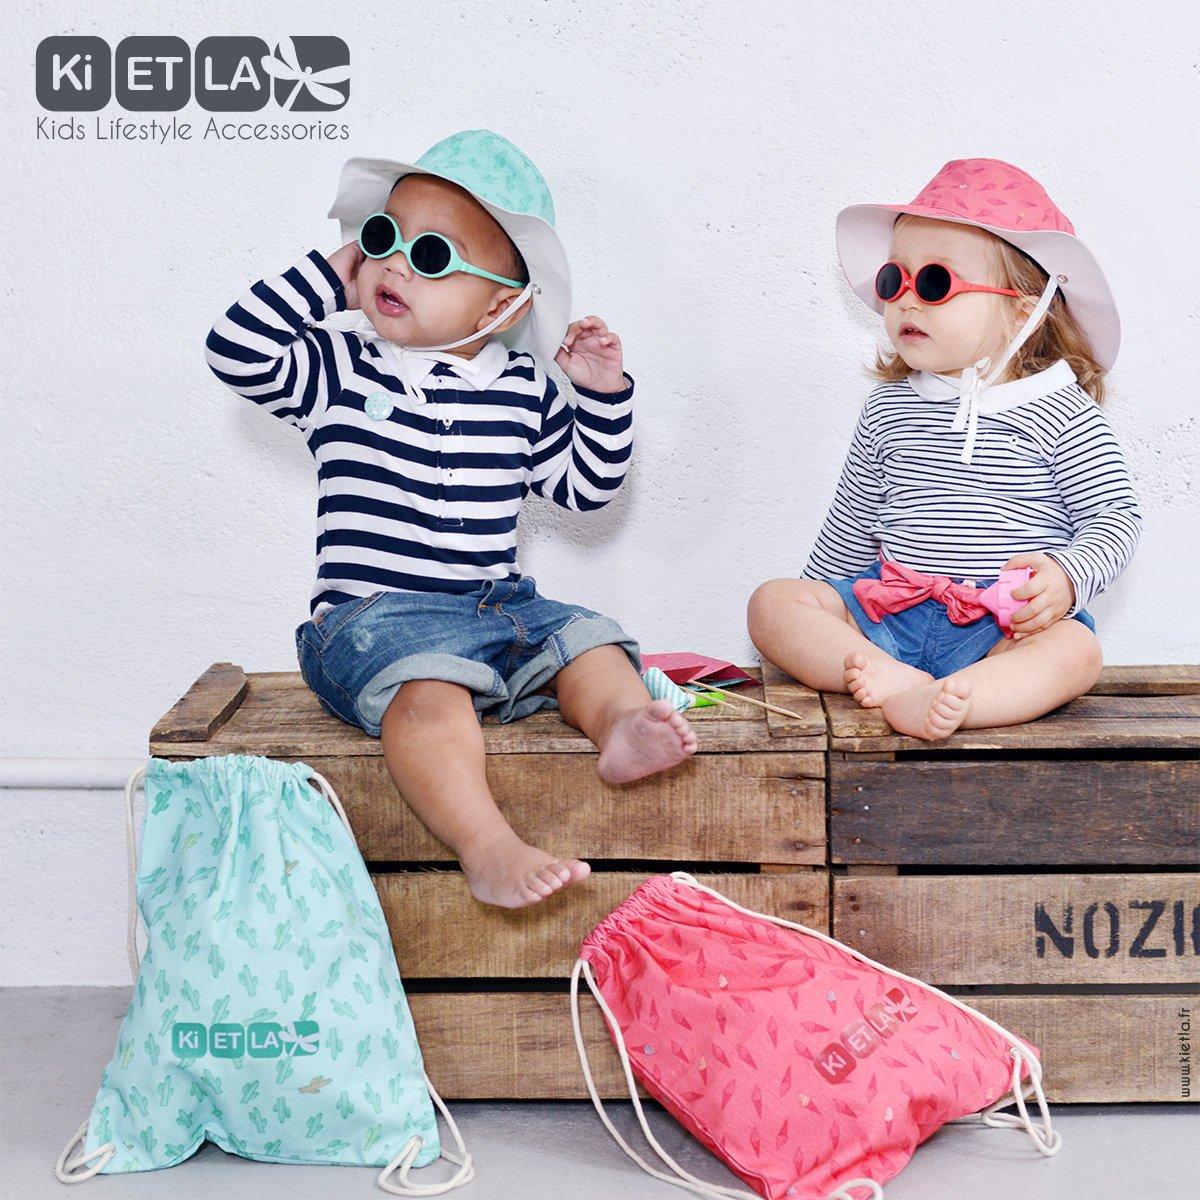 Gafas de sol y gorro anti-UV 0-18 meses Kit playa para b/ébes Kit Sun Set Ki ET LA Color frambuesa